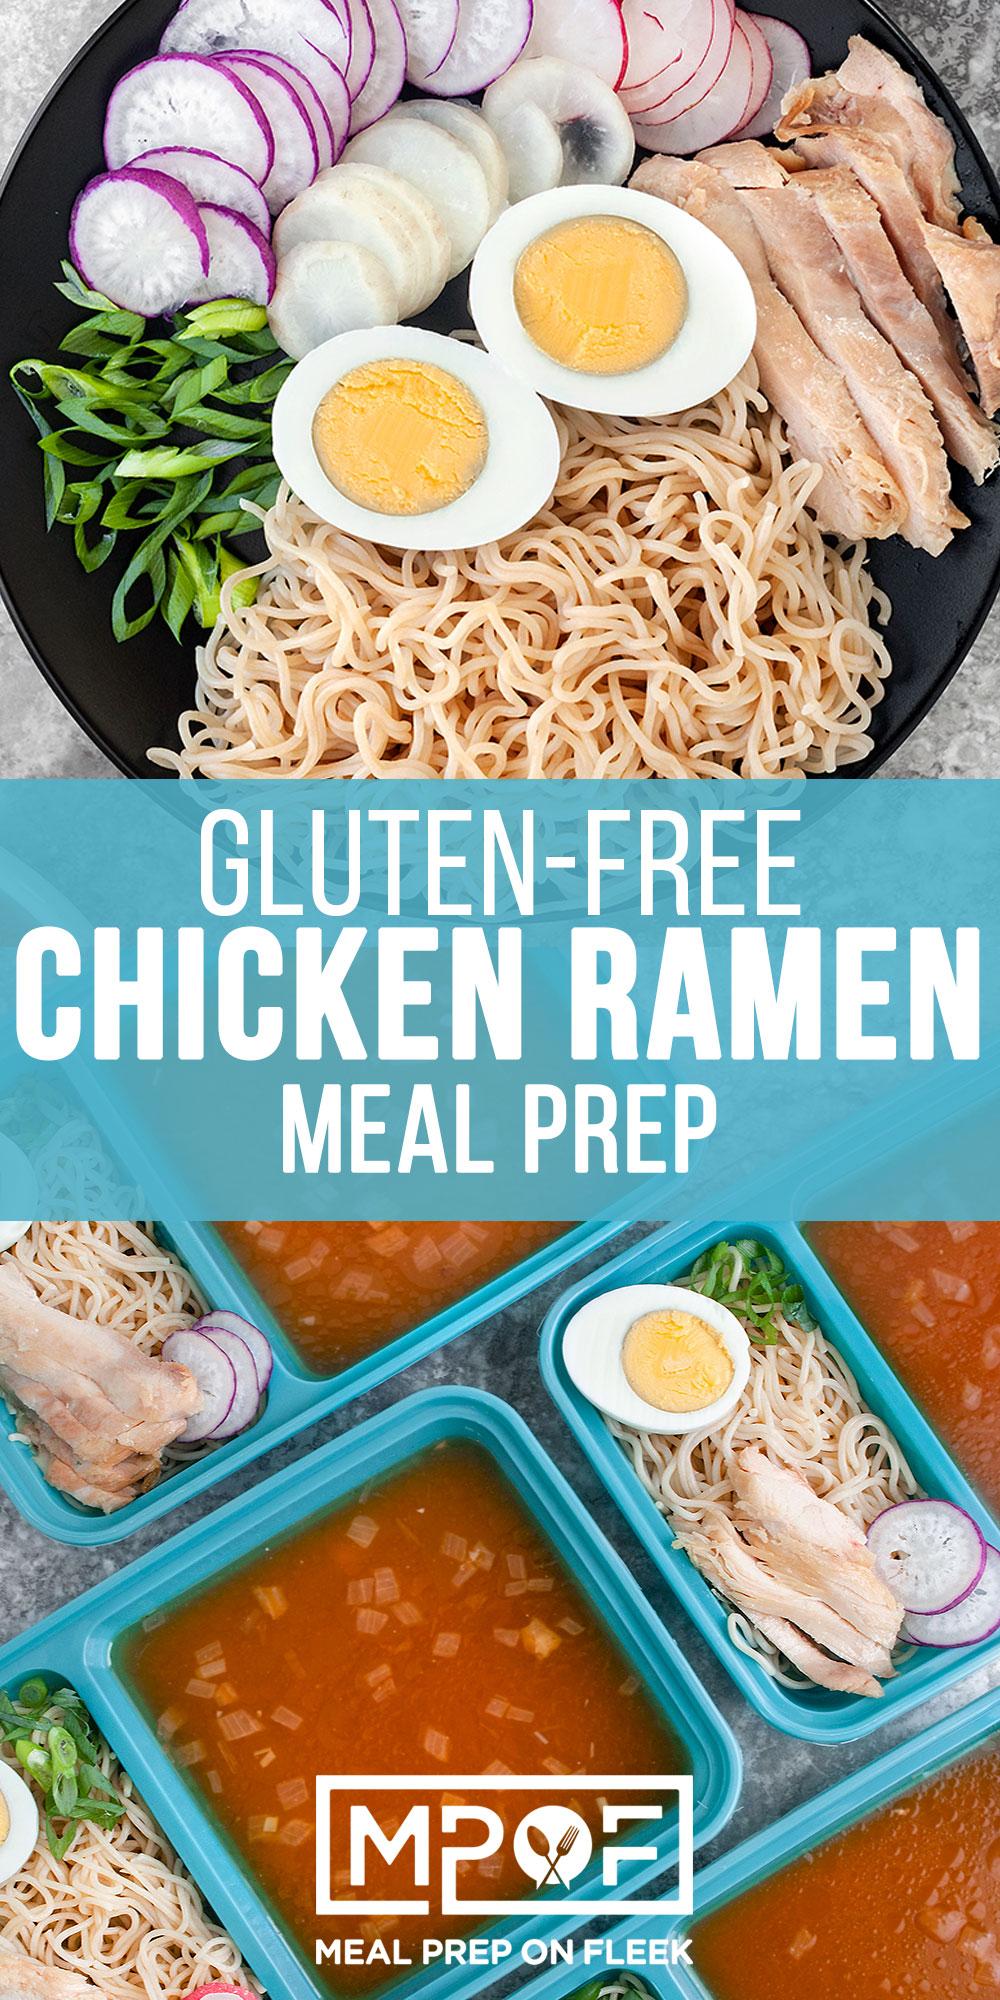 Chicken Ramen Meal Prep